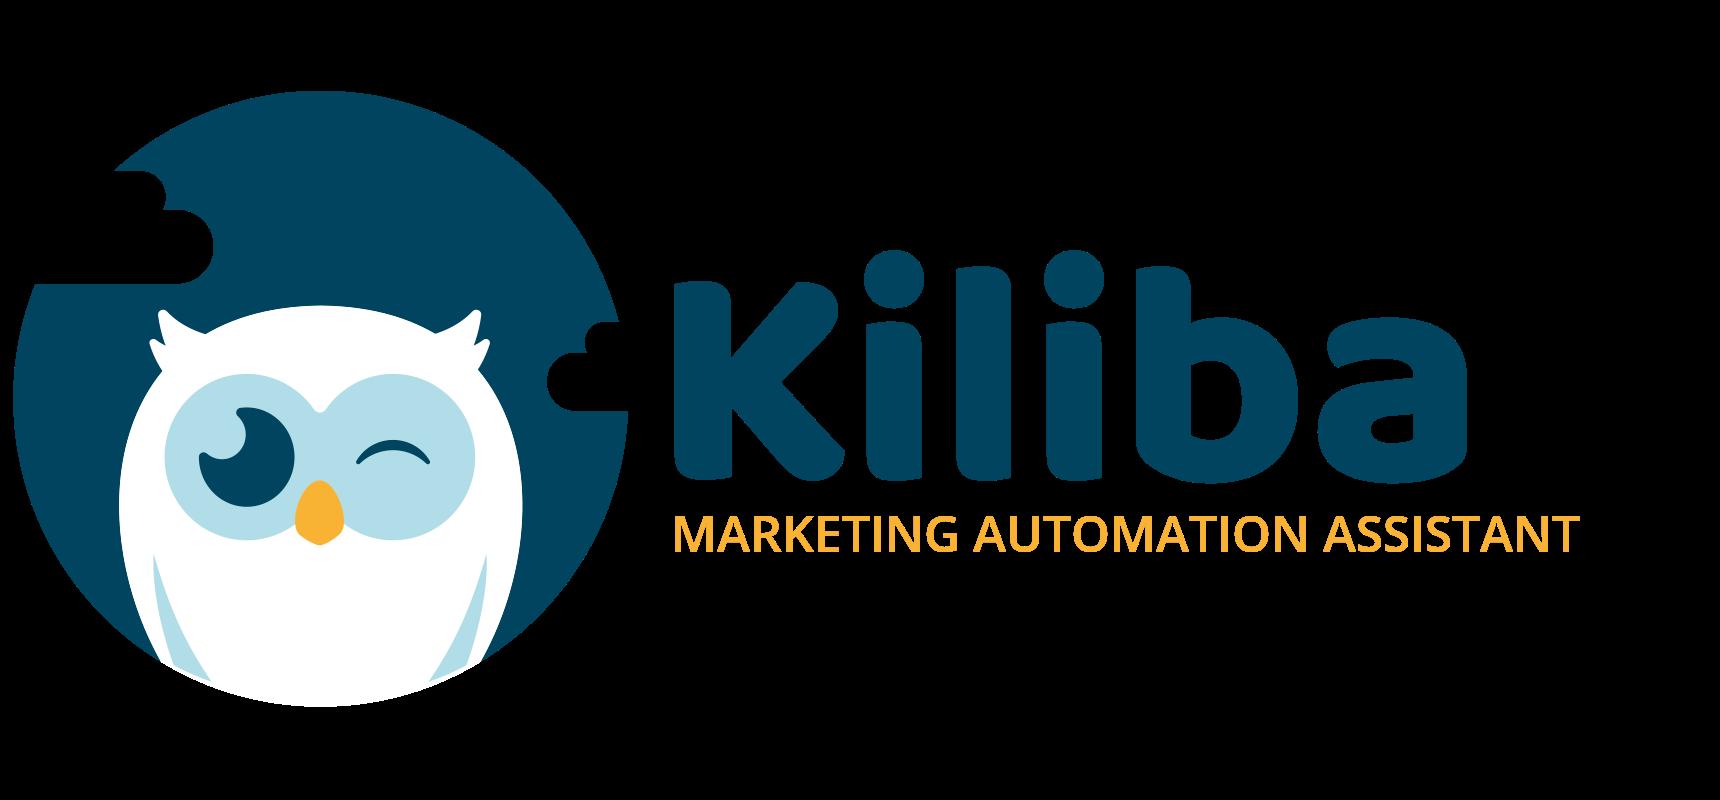 Marketing automation : Kiliba devient multilingue